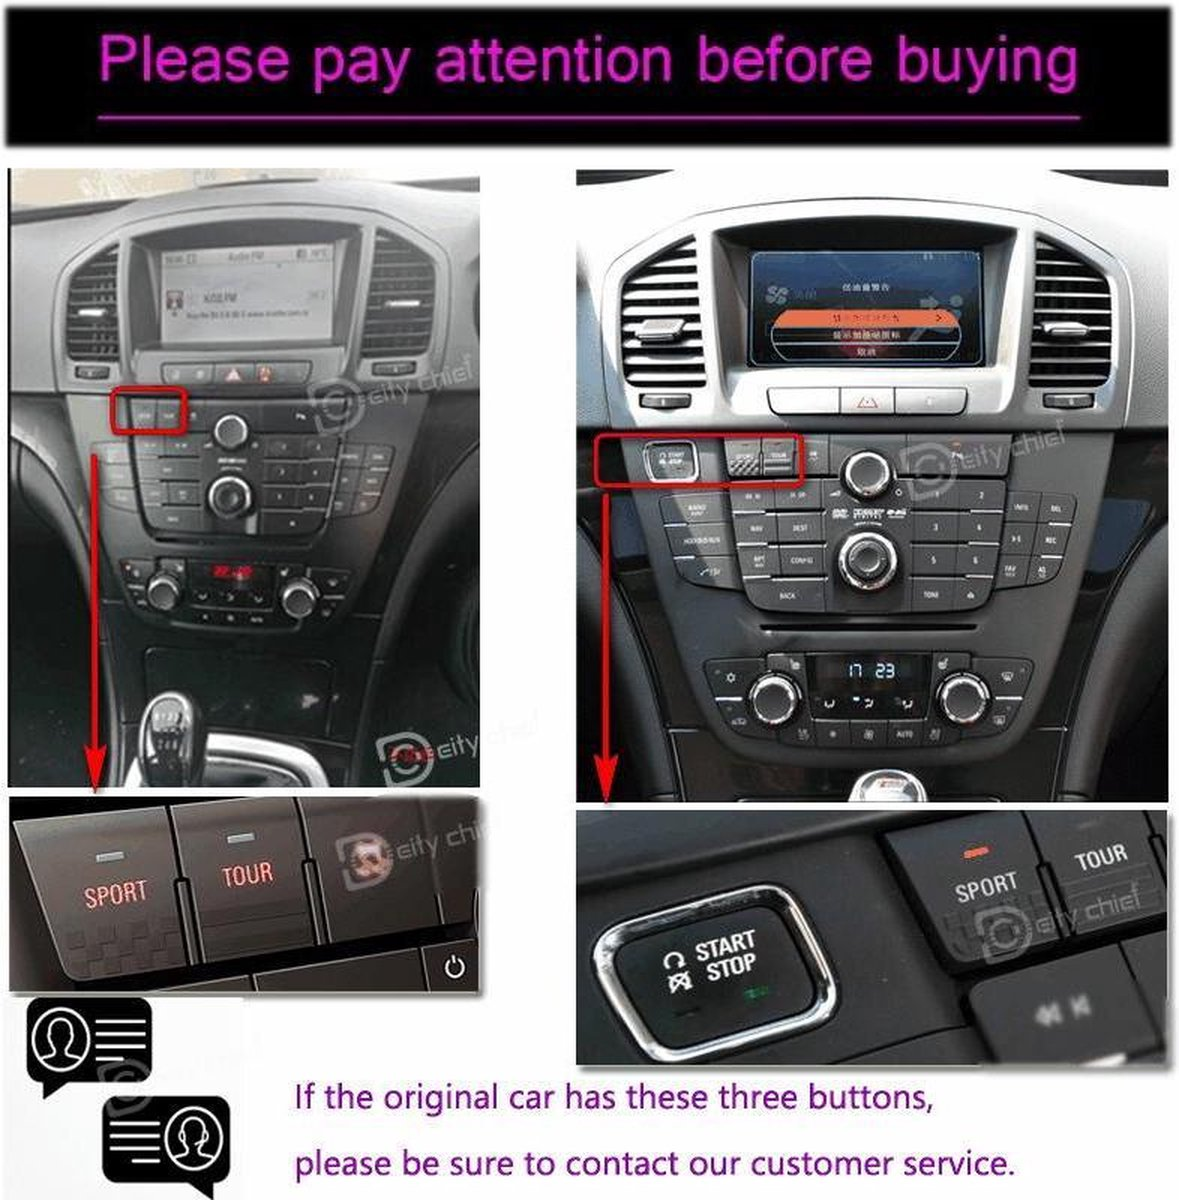 Opel Insignia 2008-2011 Android 9.0 navigatie en multimediasysteem 10,4 inch scherm 2+32GB Bruin